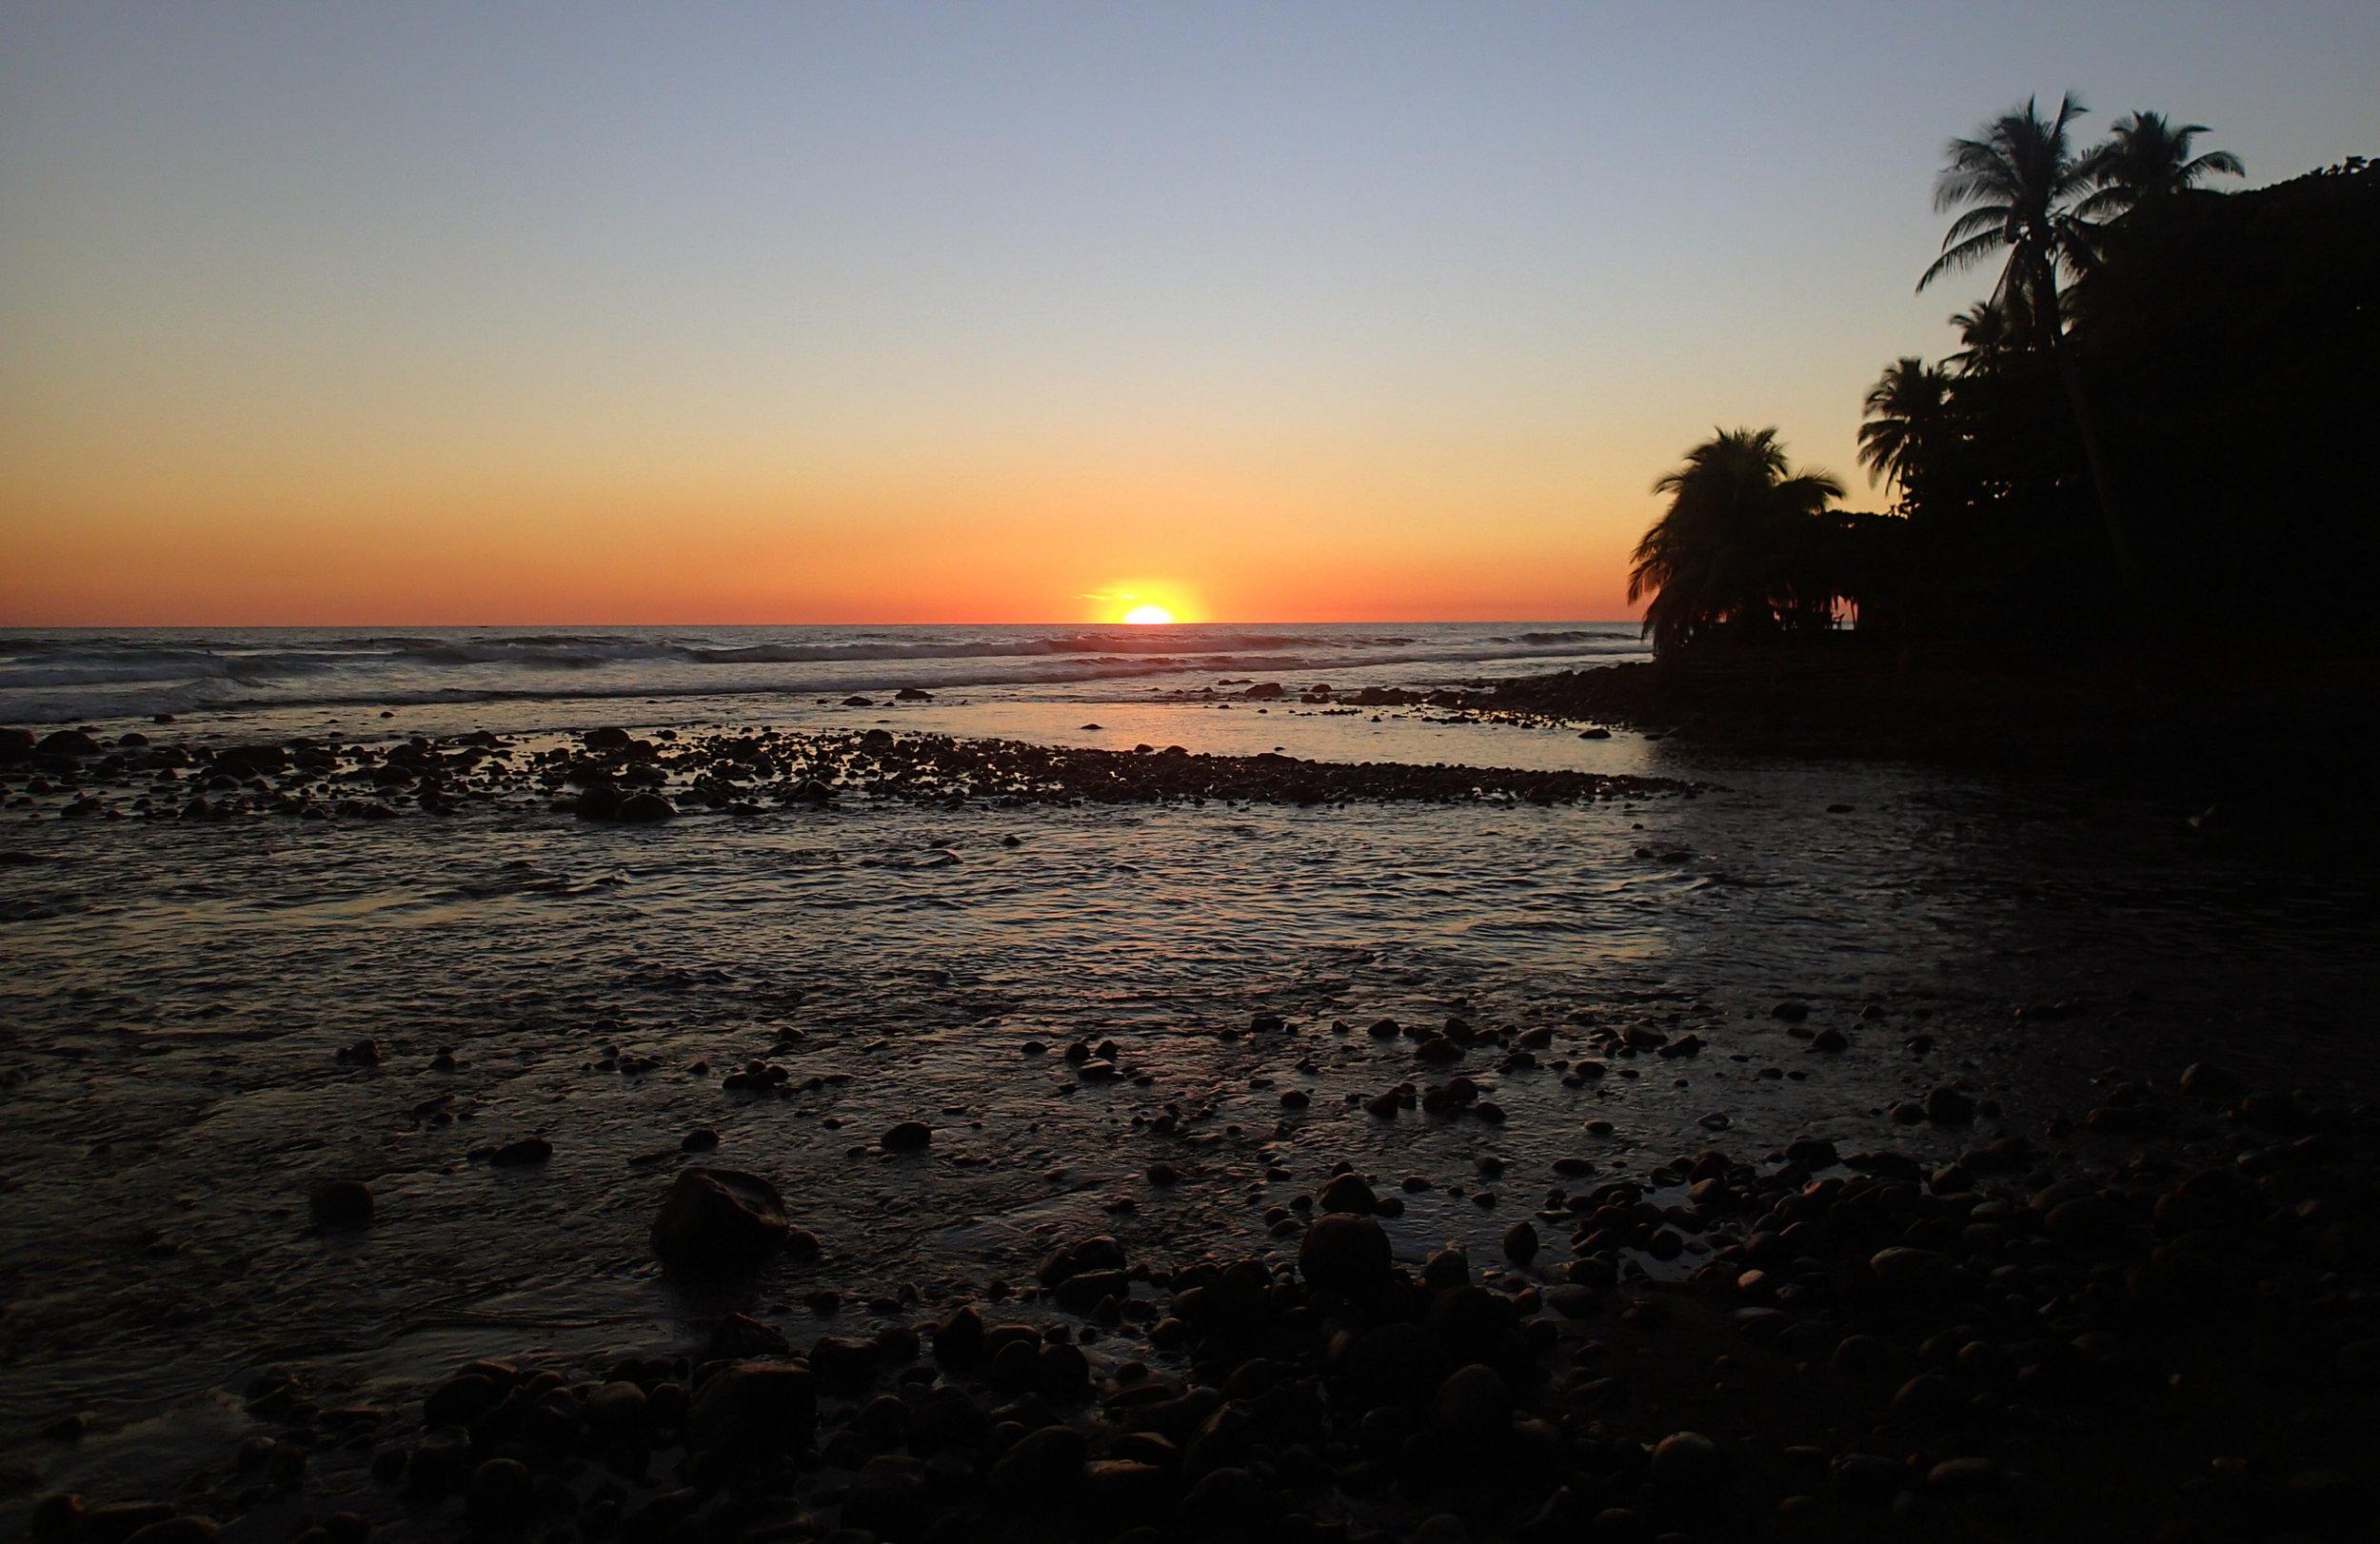 sunset 12-8-14.jpg